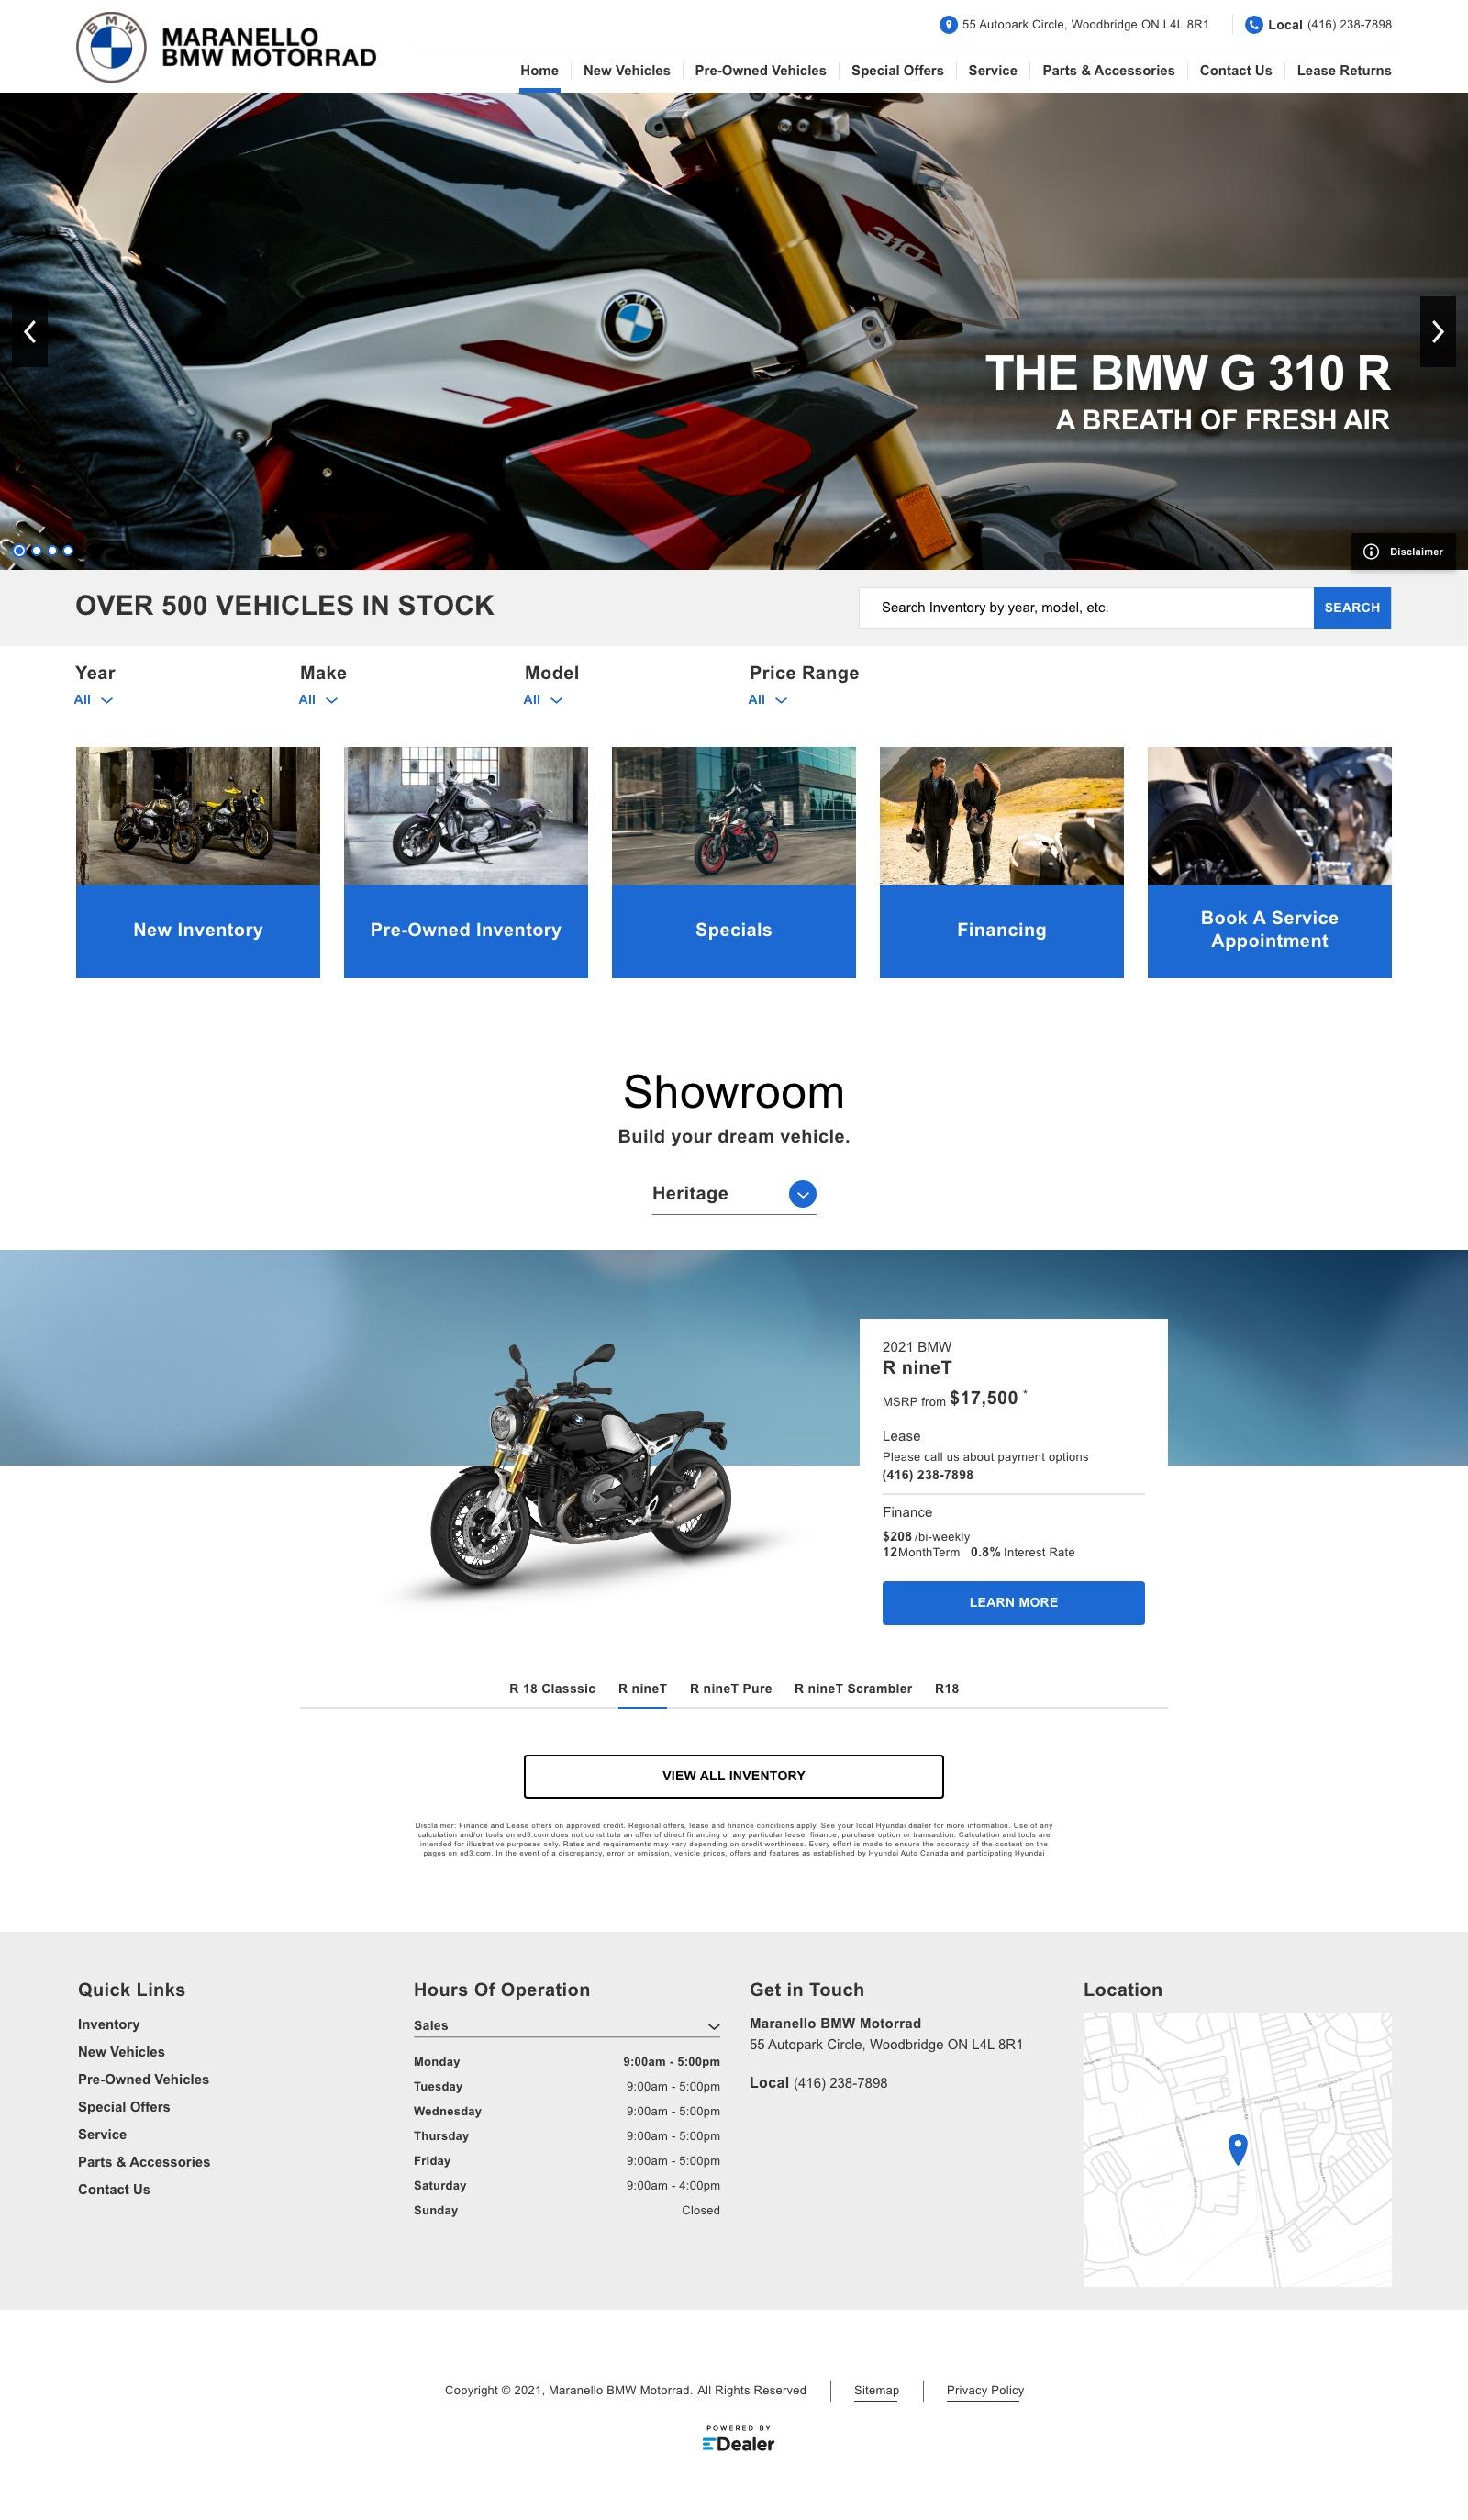 Maranello BMW Motorrad